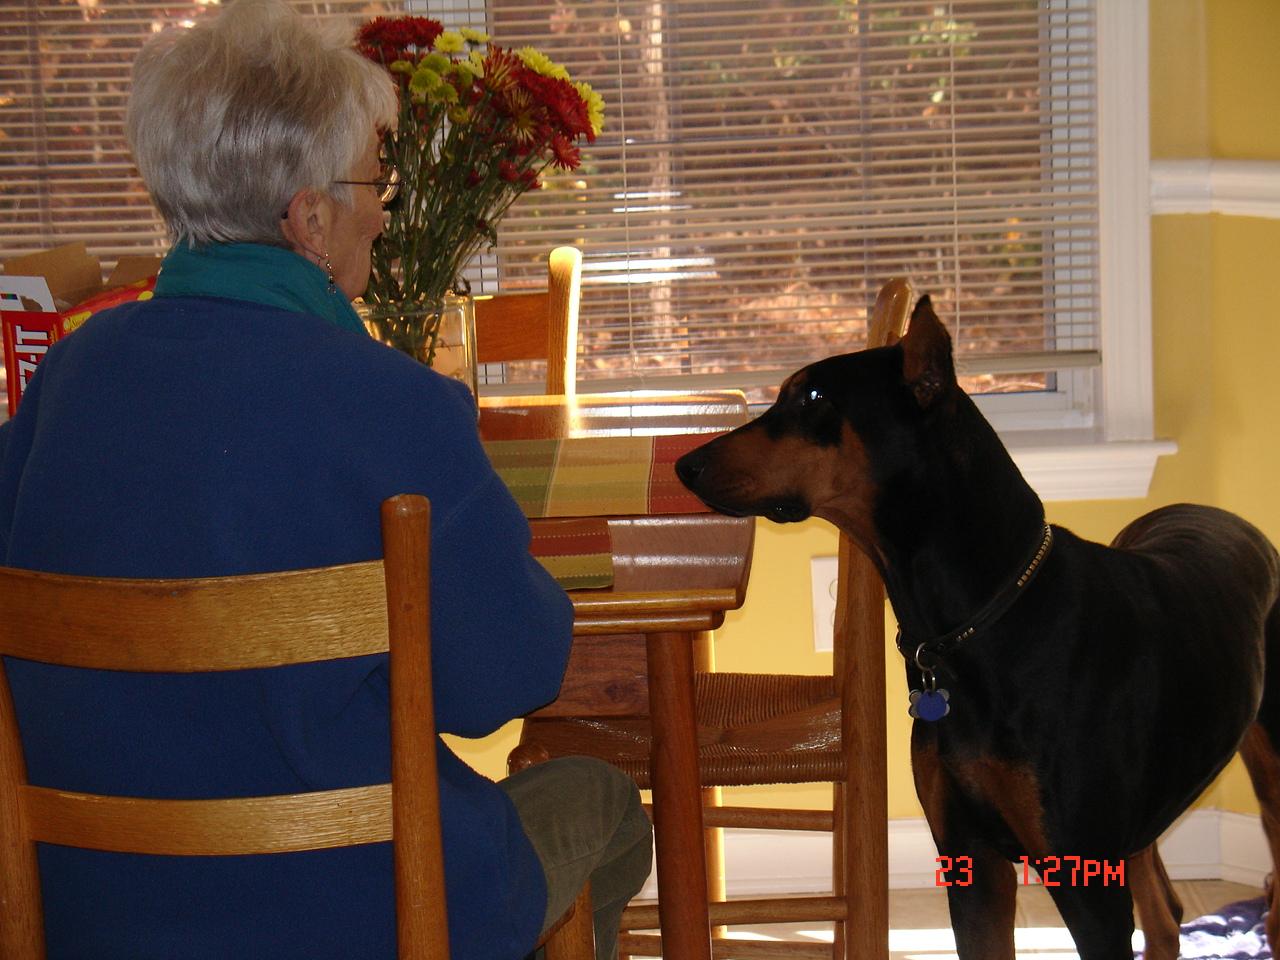 Rex and granny